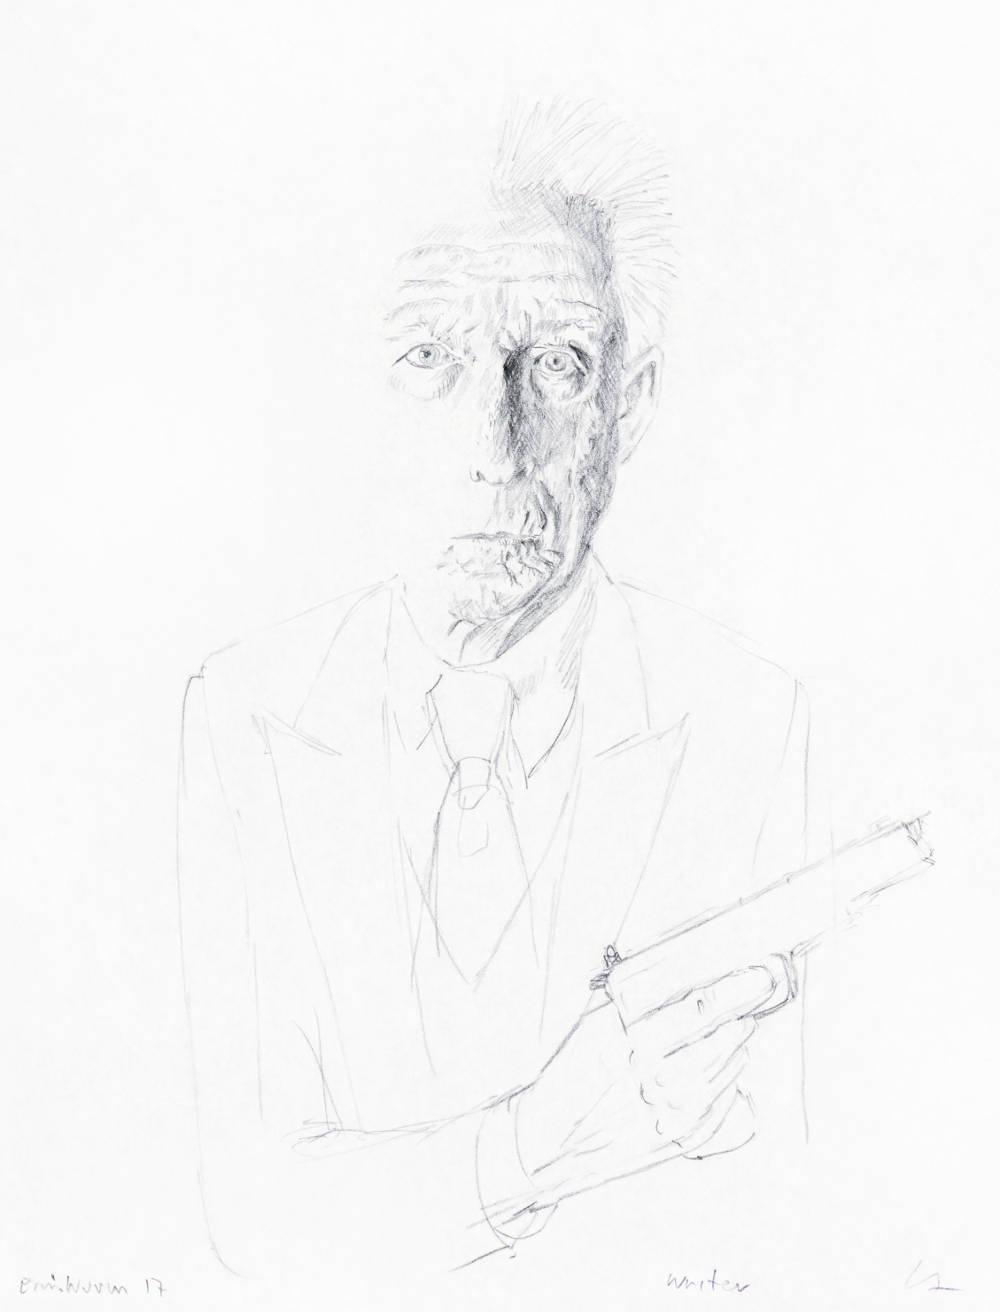 Erwin Wurm, Writer, 2017. Pencil on paper 29.7 x 21 cm